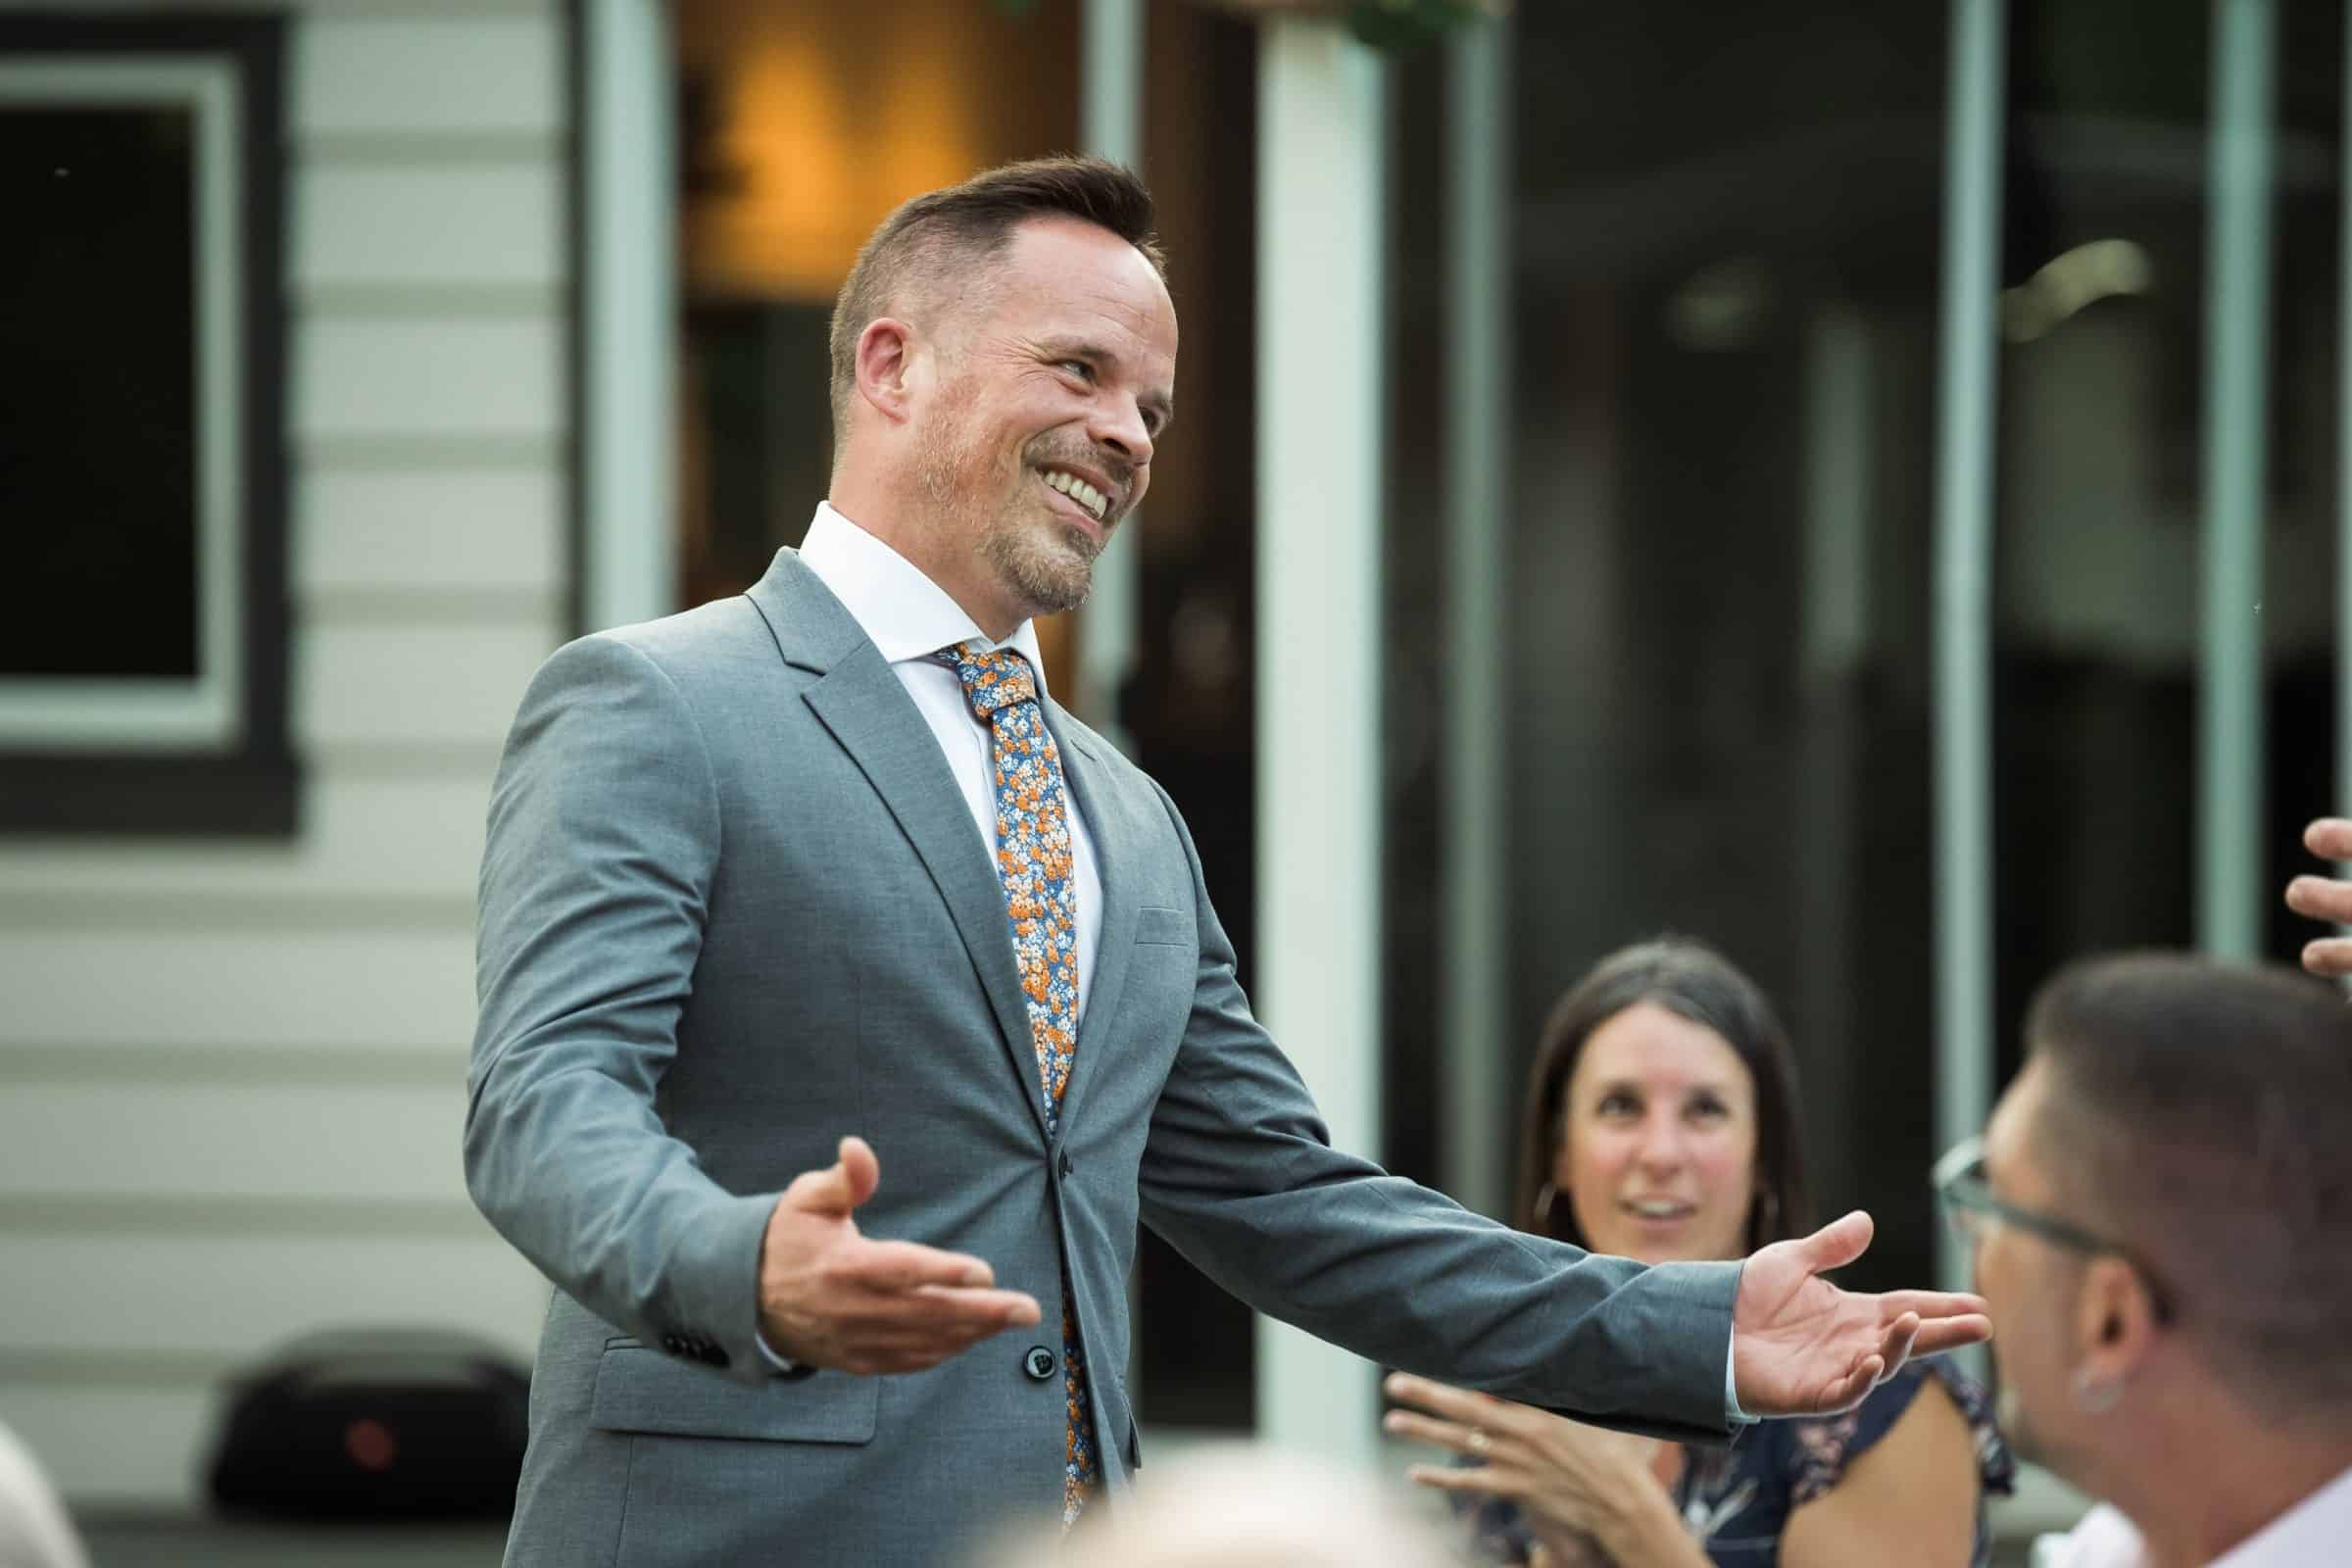 groomsman laughing and gesturing